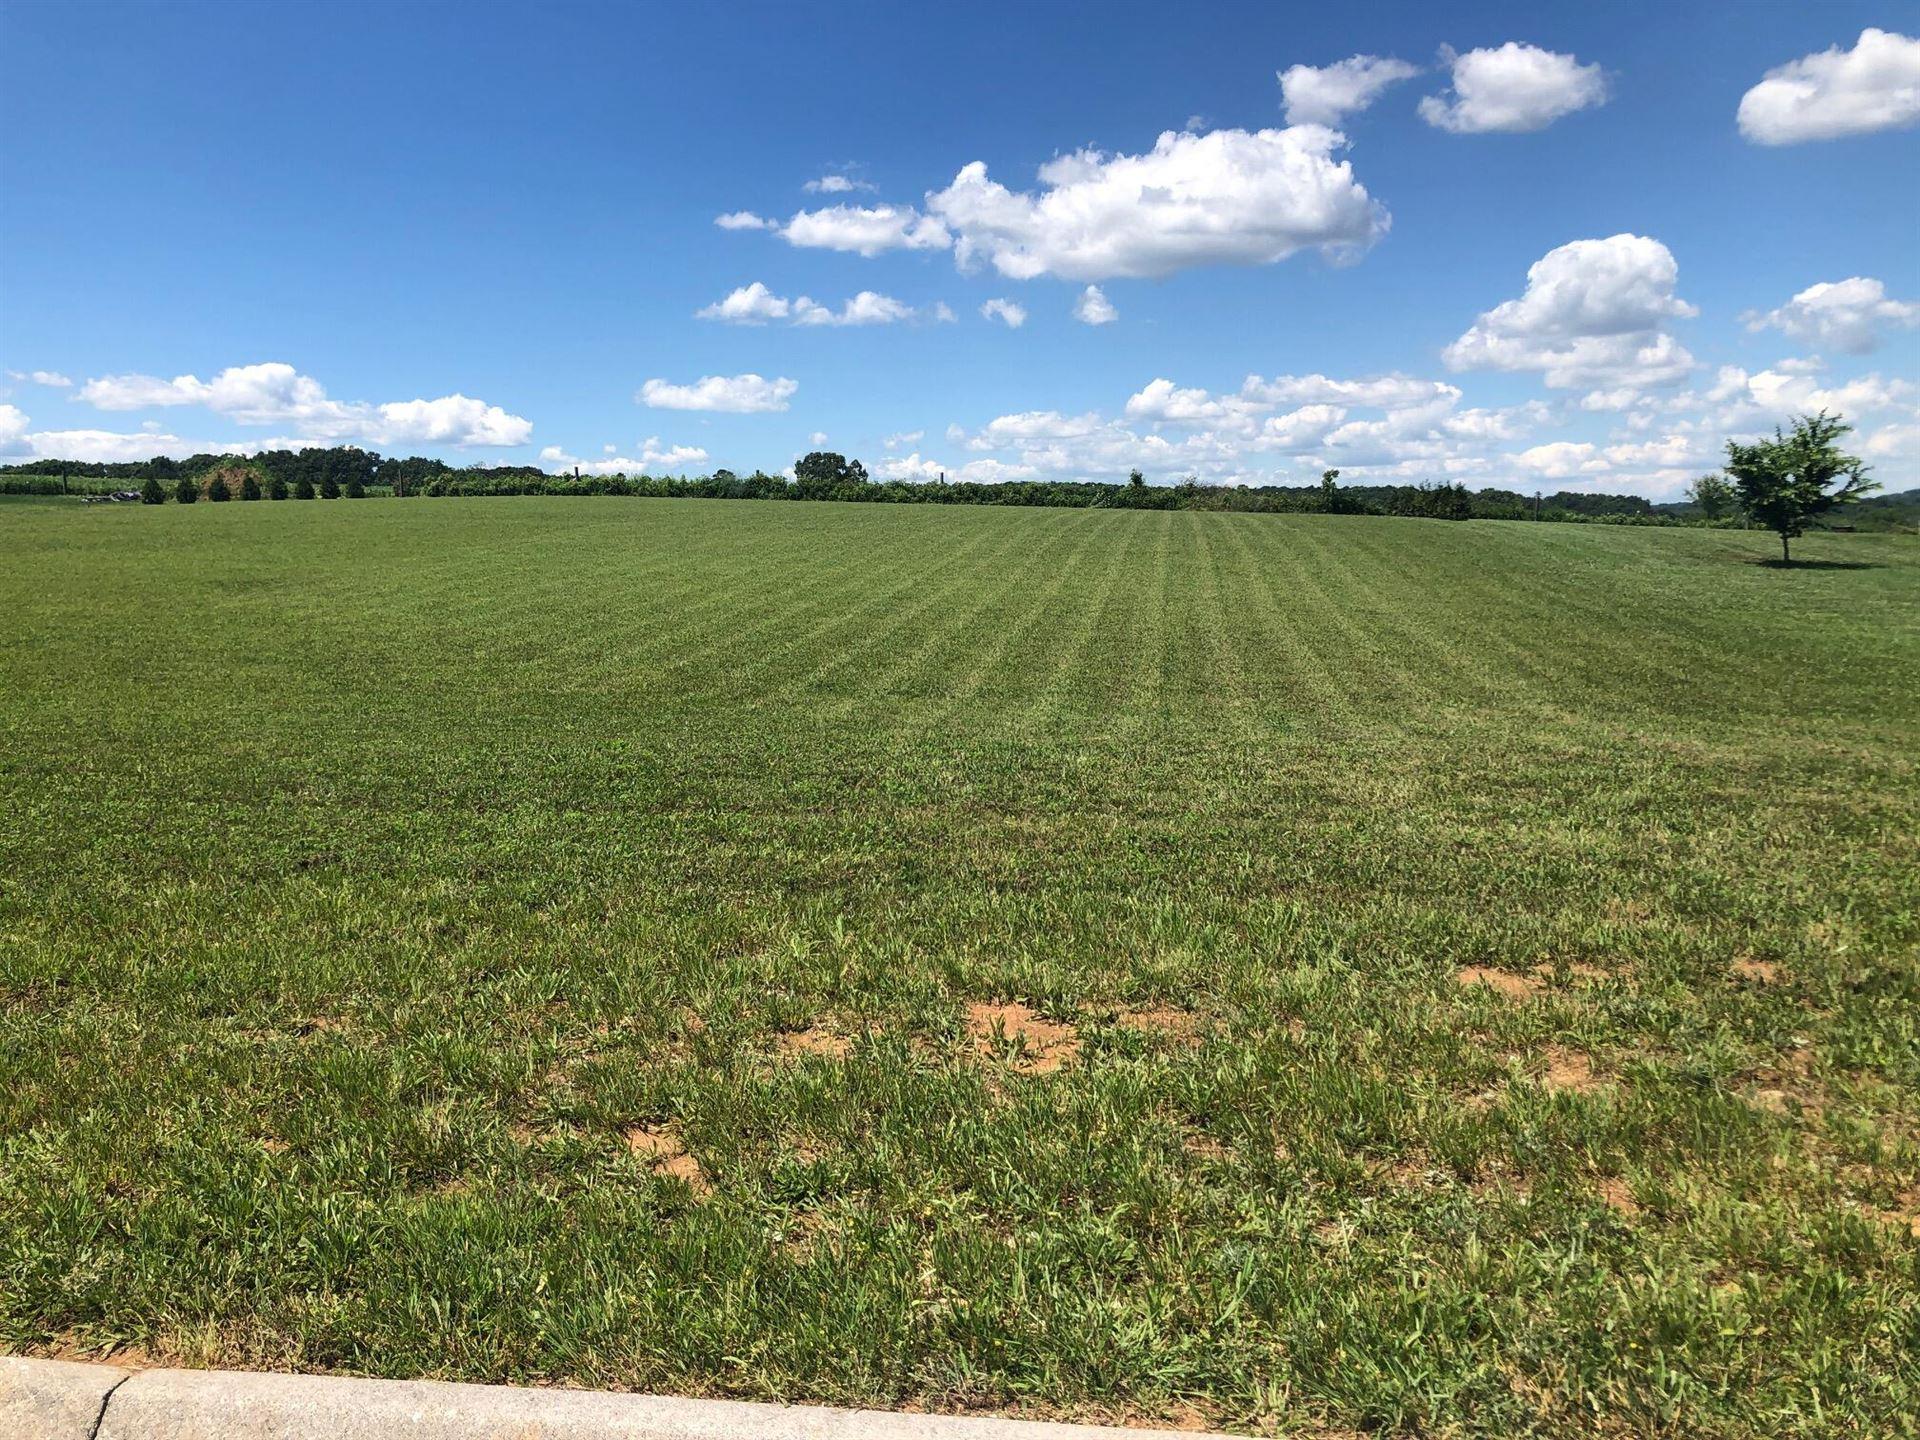 Photo of Lot 18 Eagle View Drive, Dandridge, TN 37725 (MLS # 1156887)